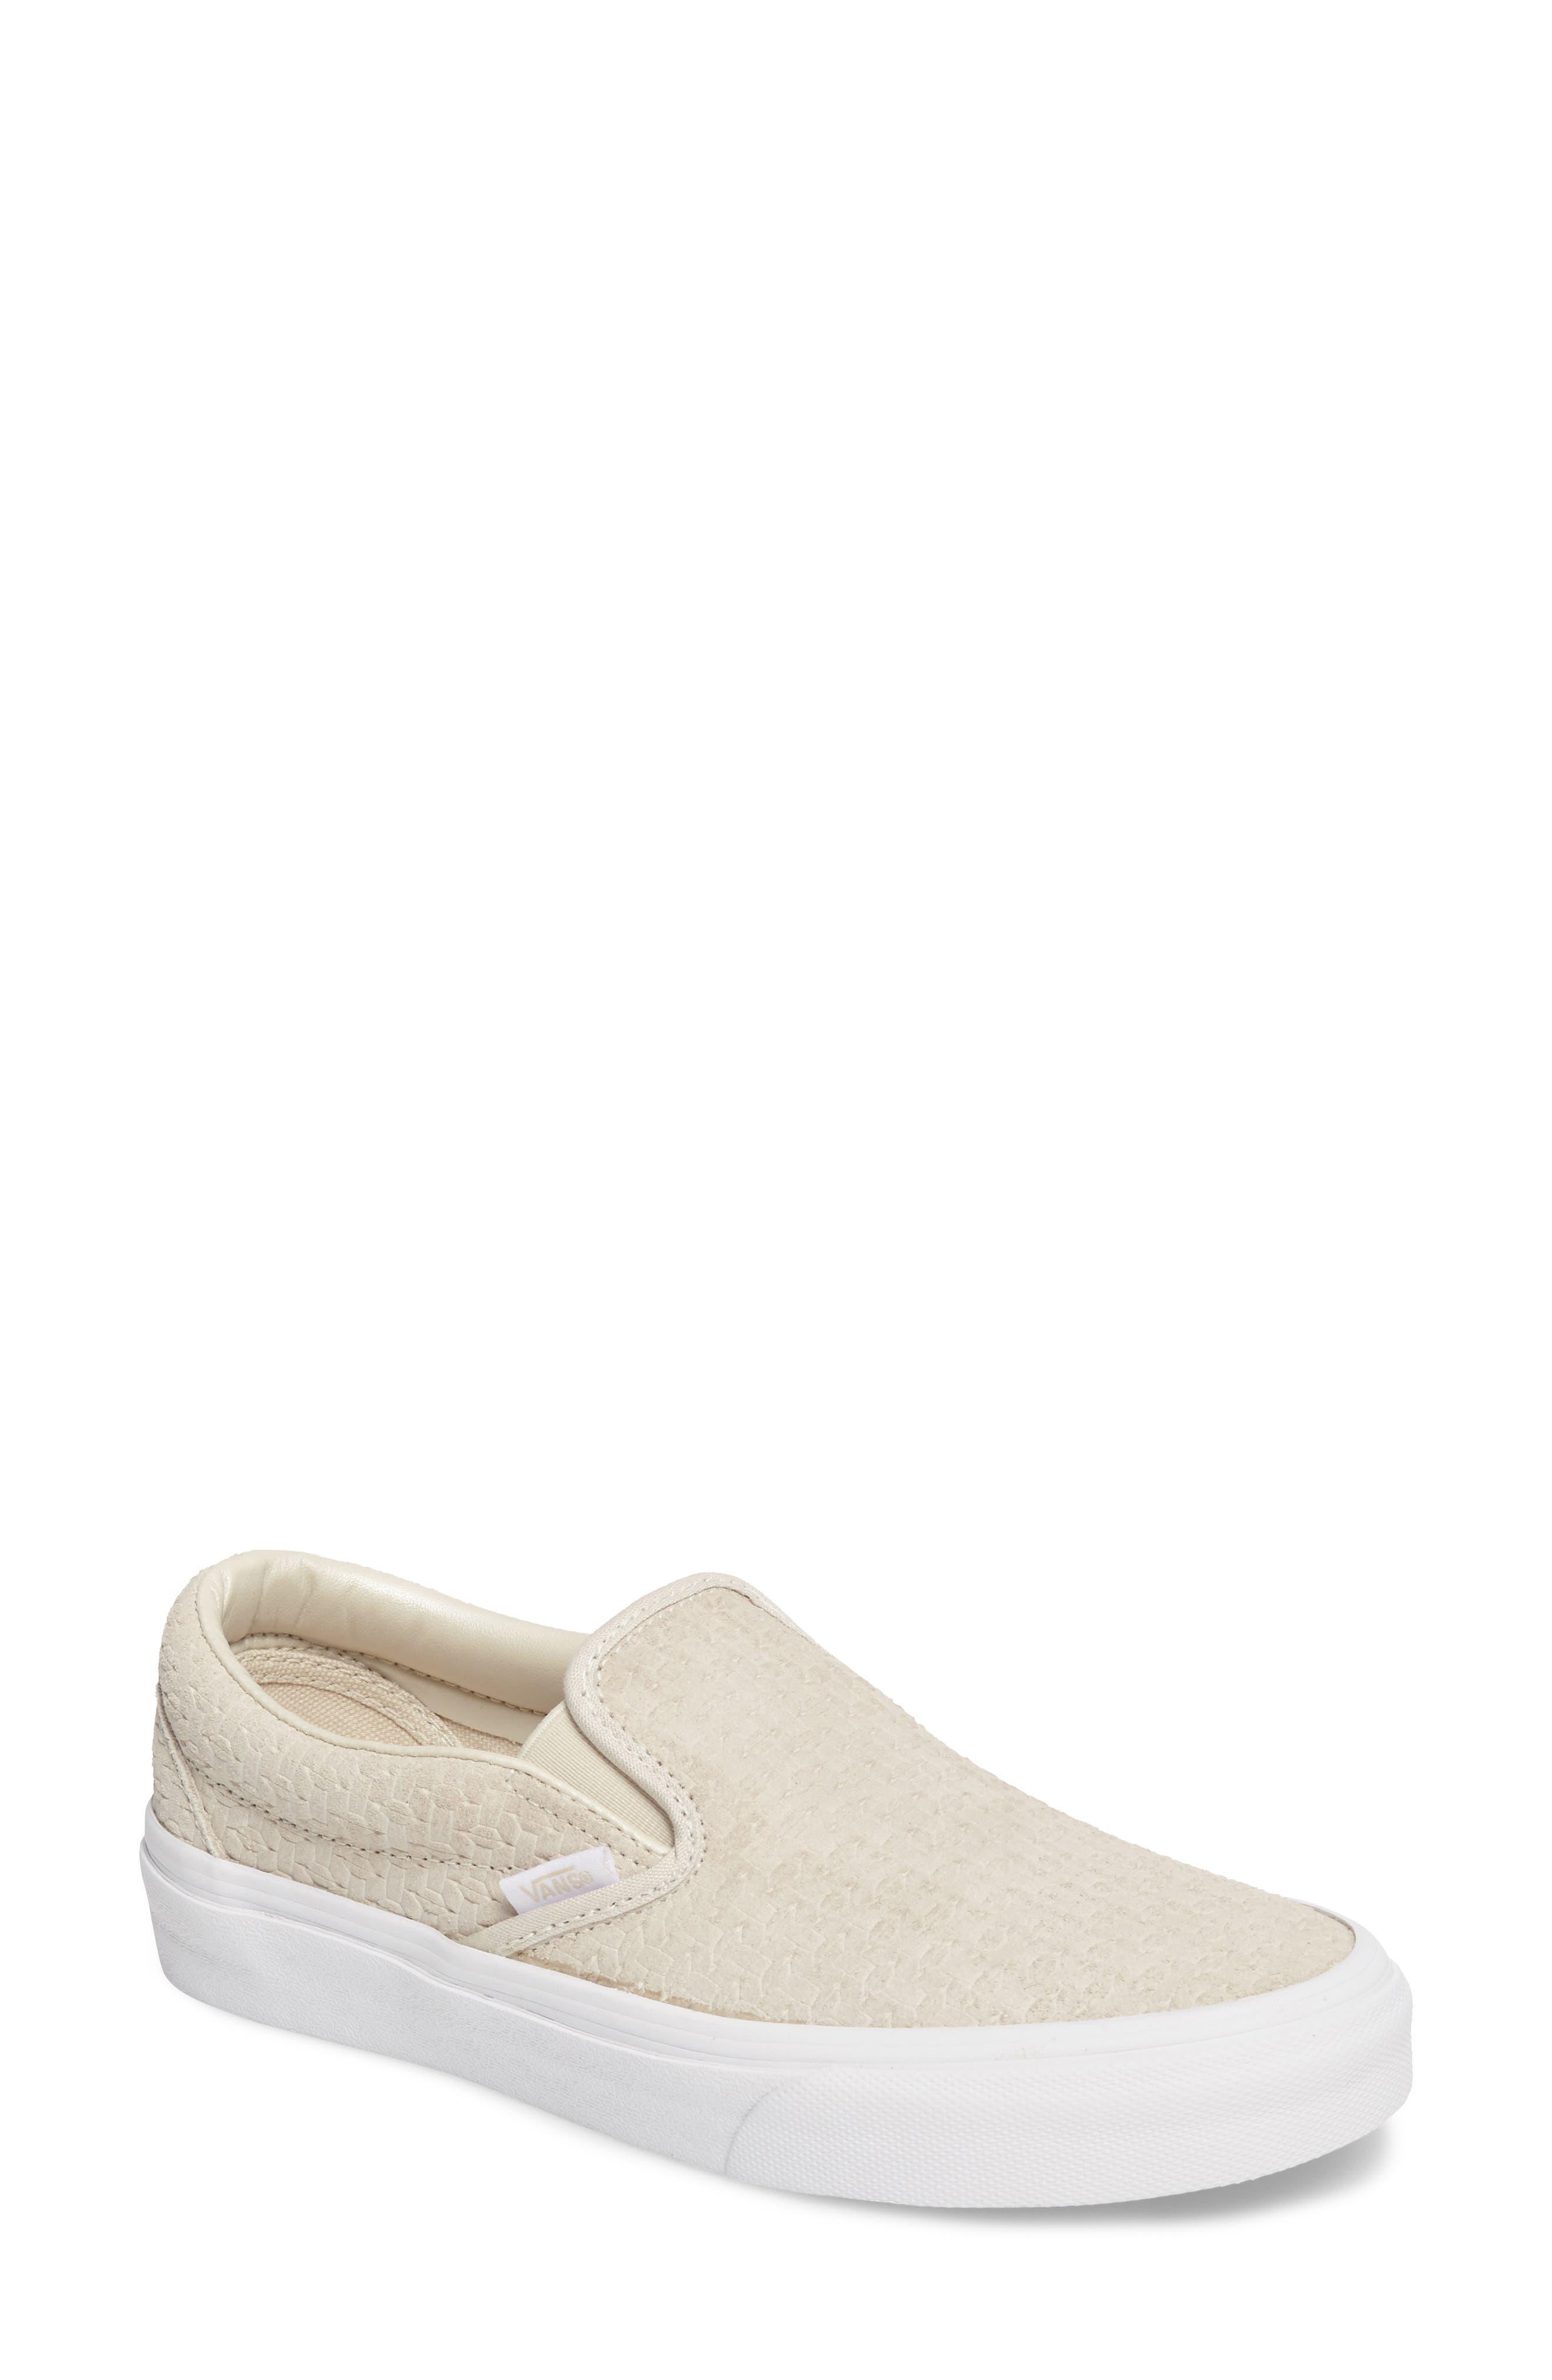 ,                             Classic Slip-On Sneaker,                             Main thumbnail 330, color,                             270